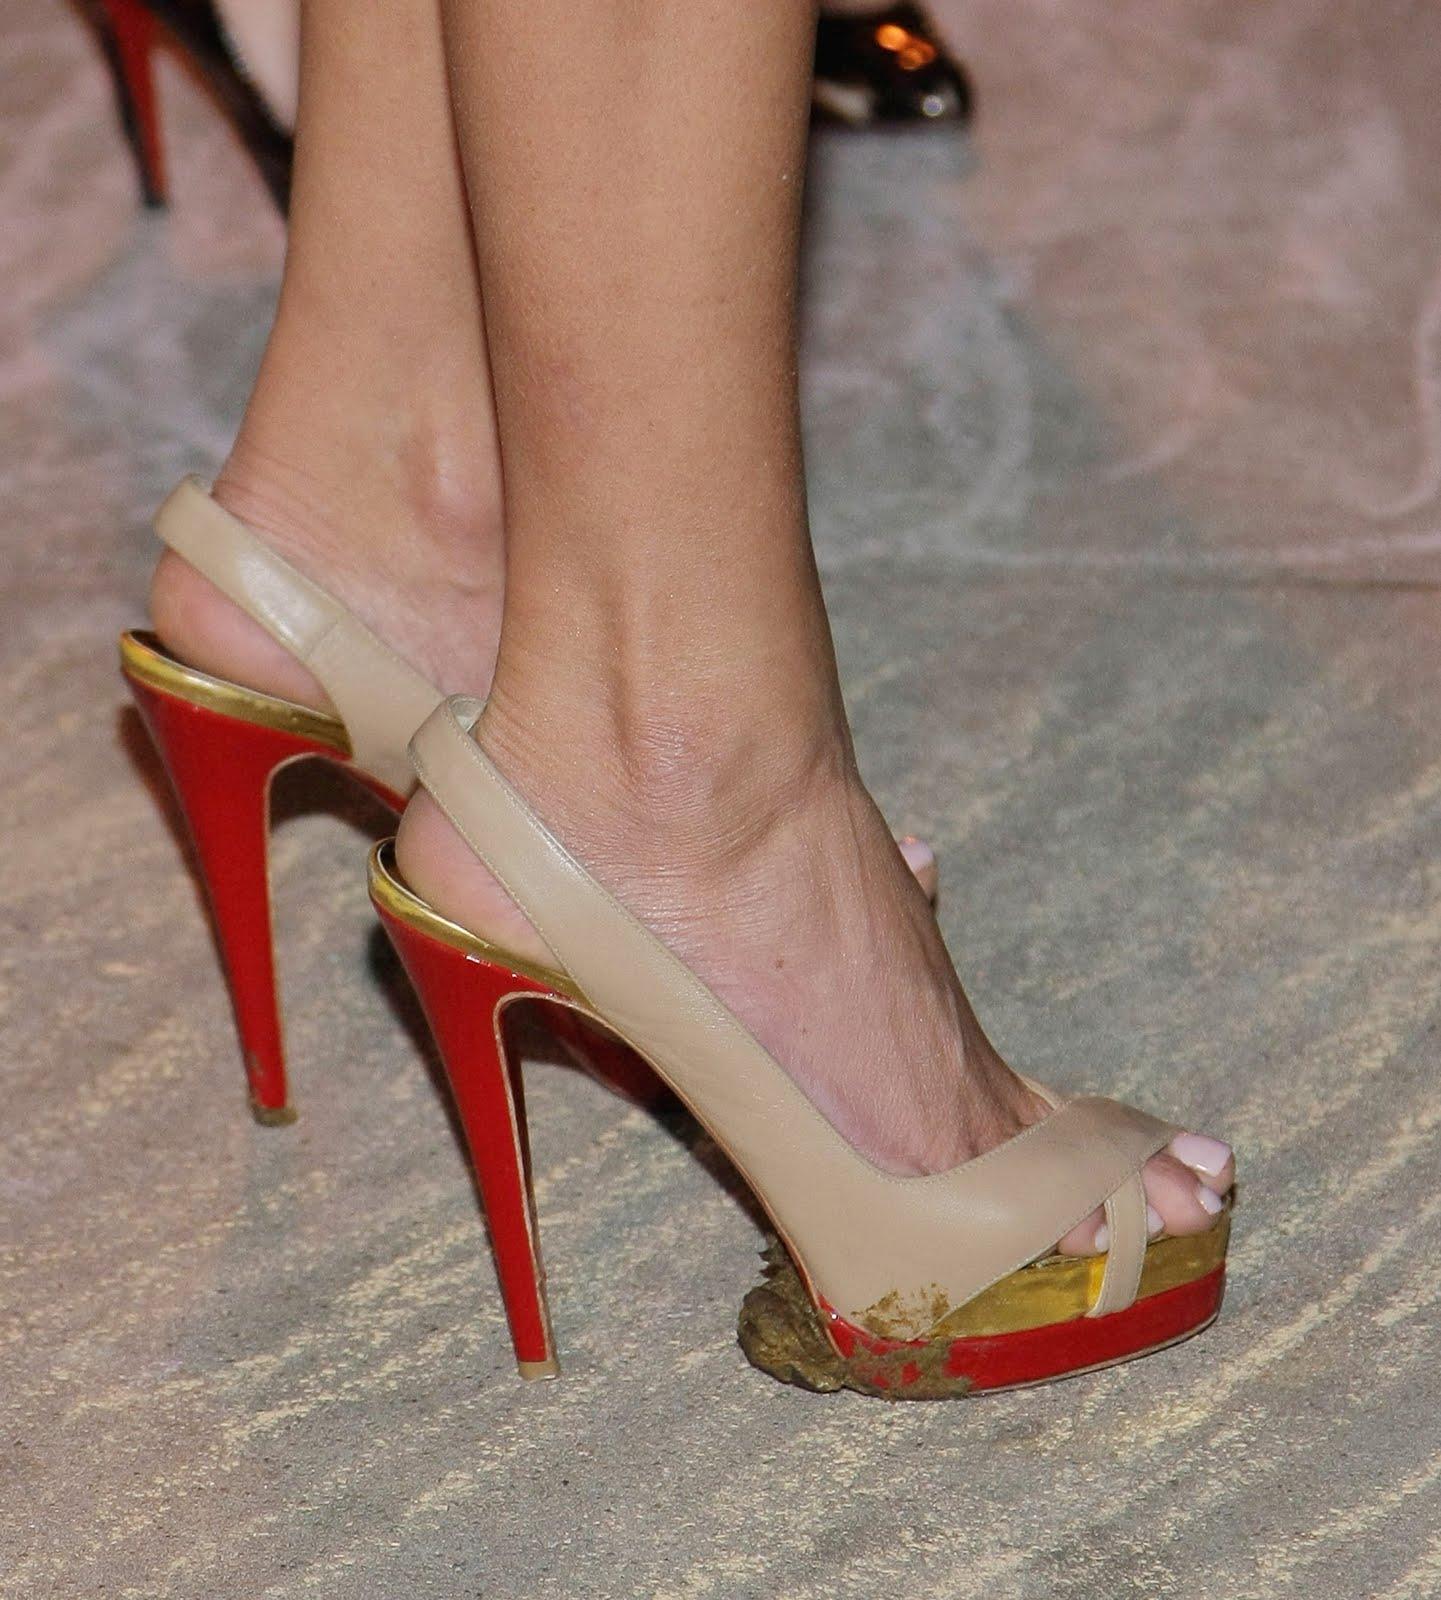 Hollywood Star Feet: Tara Reid Feet